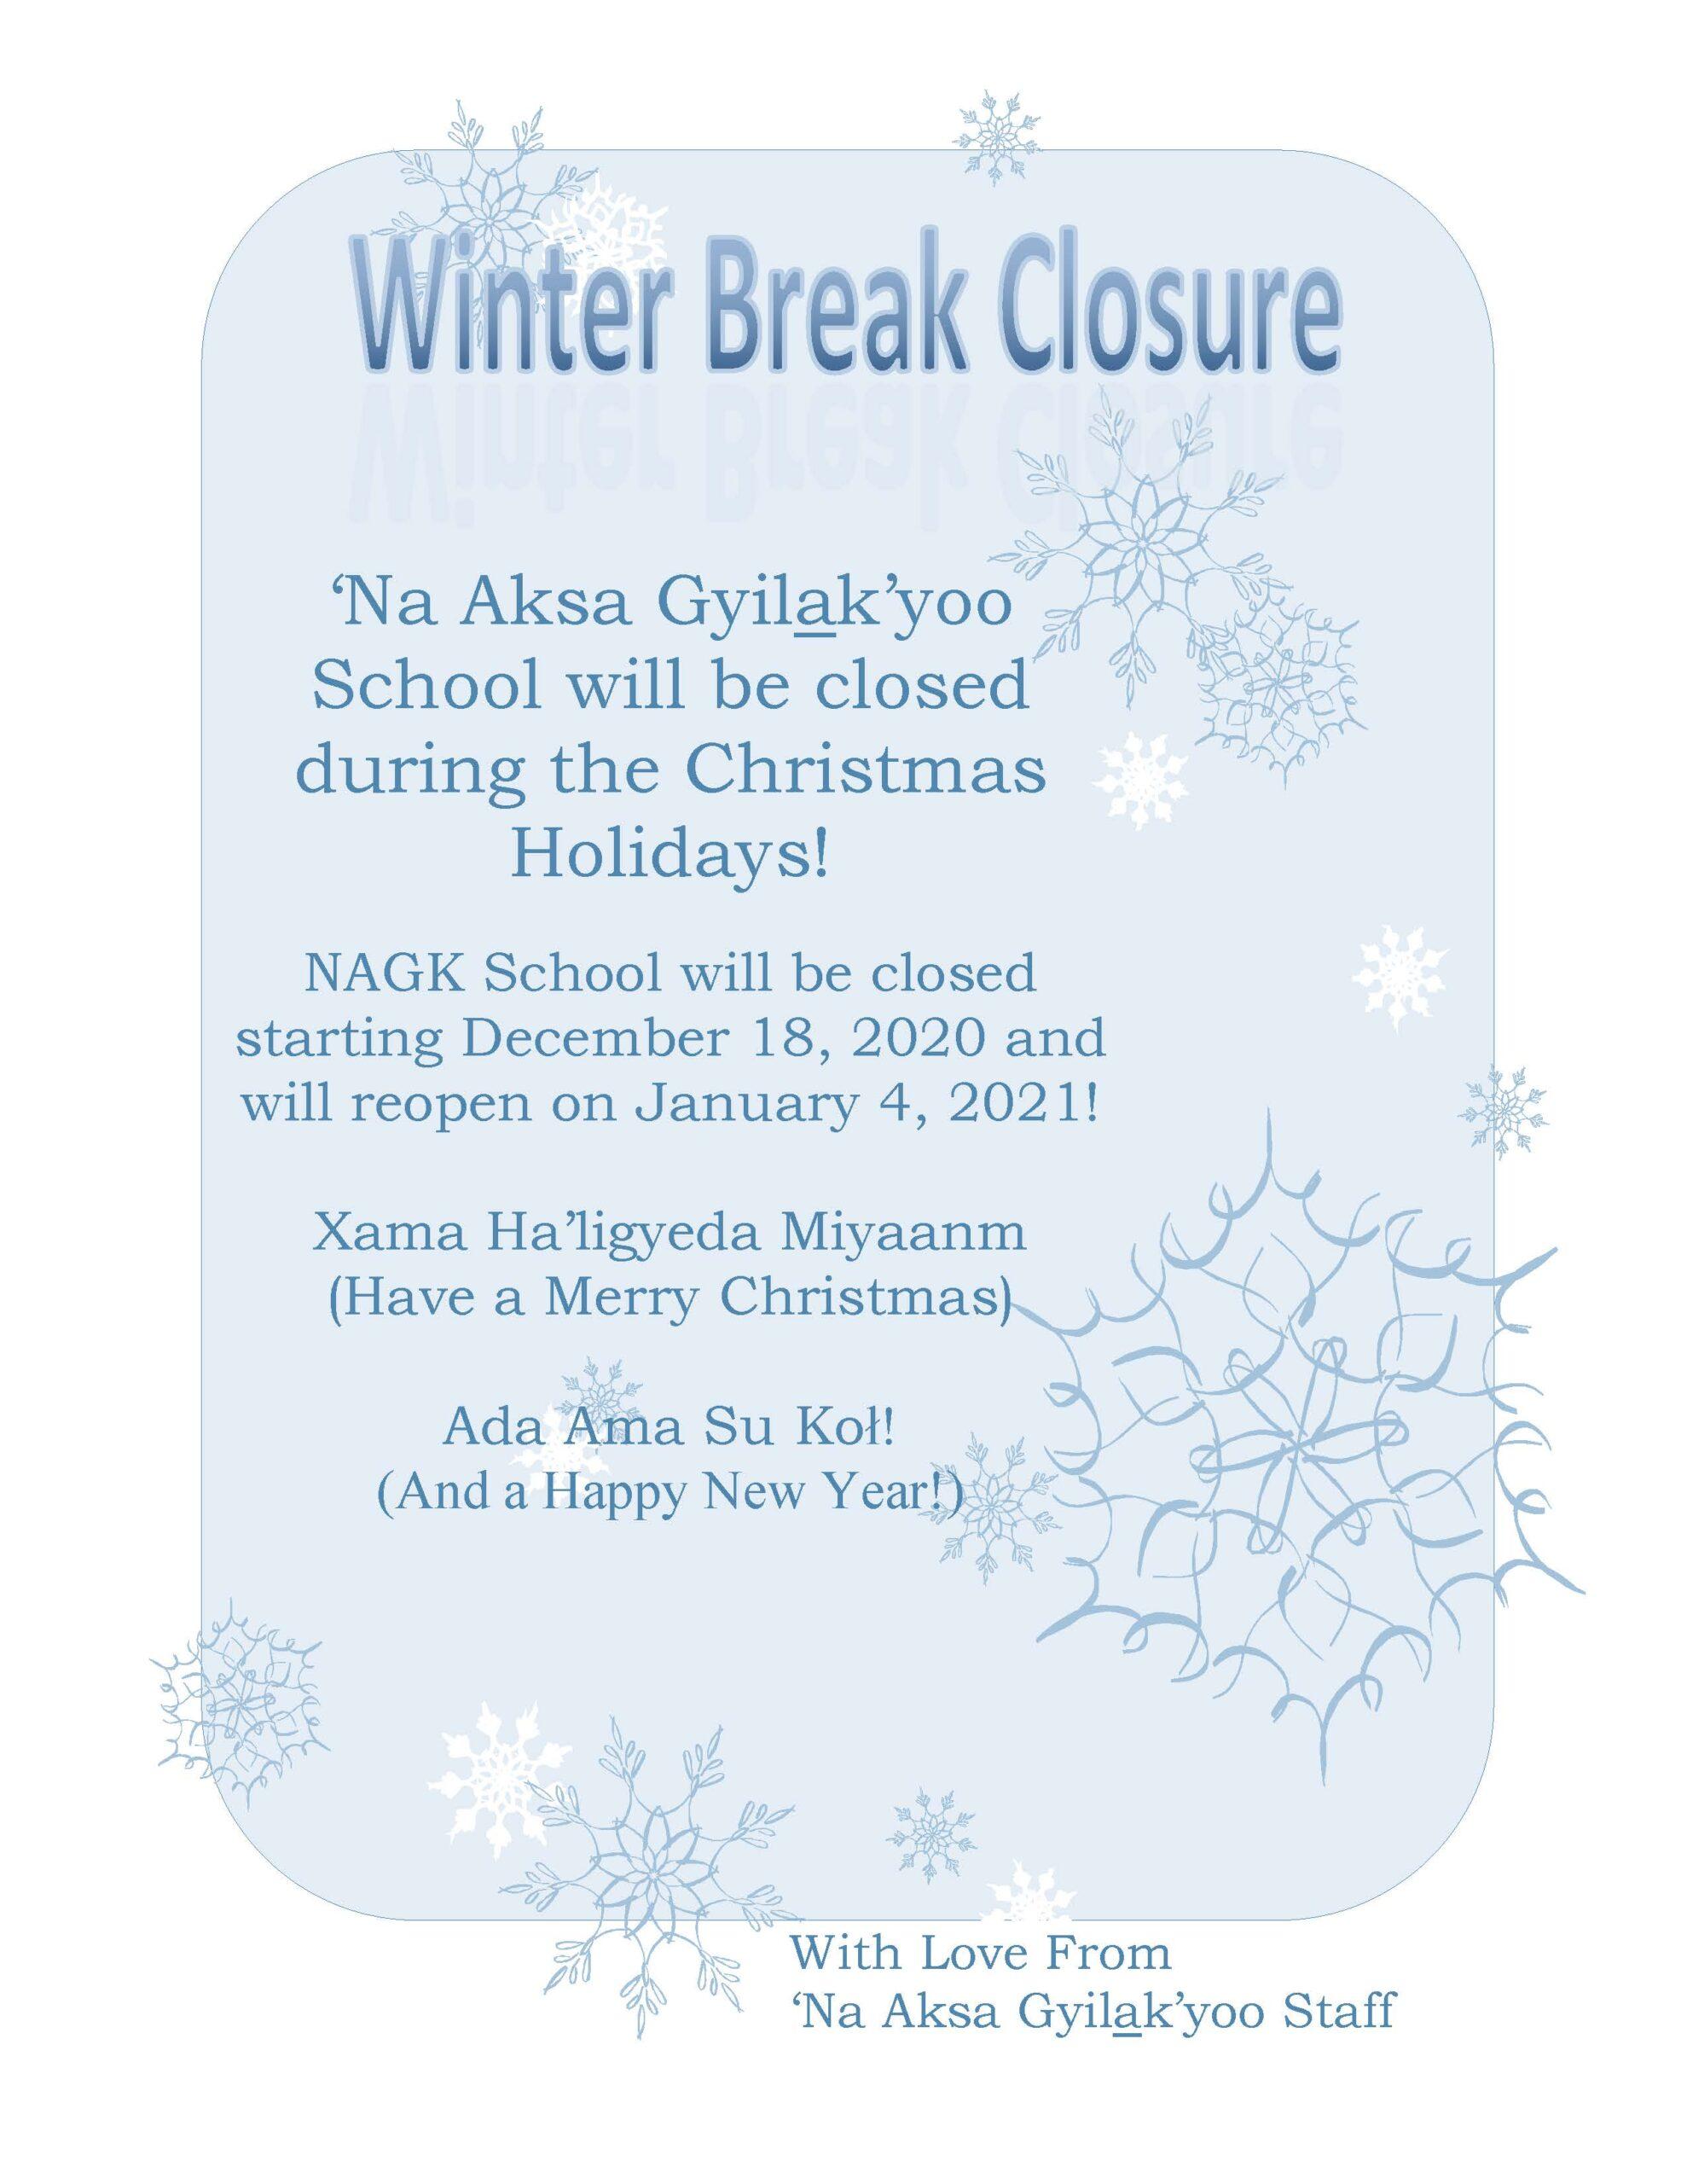 Winter Break Closure 2020